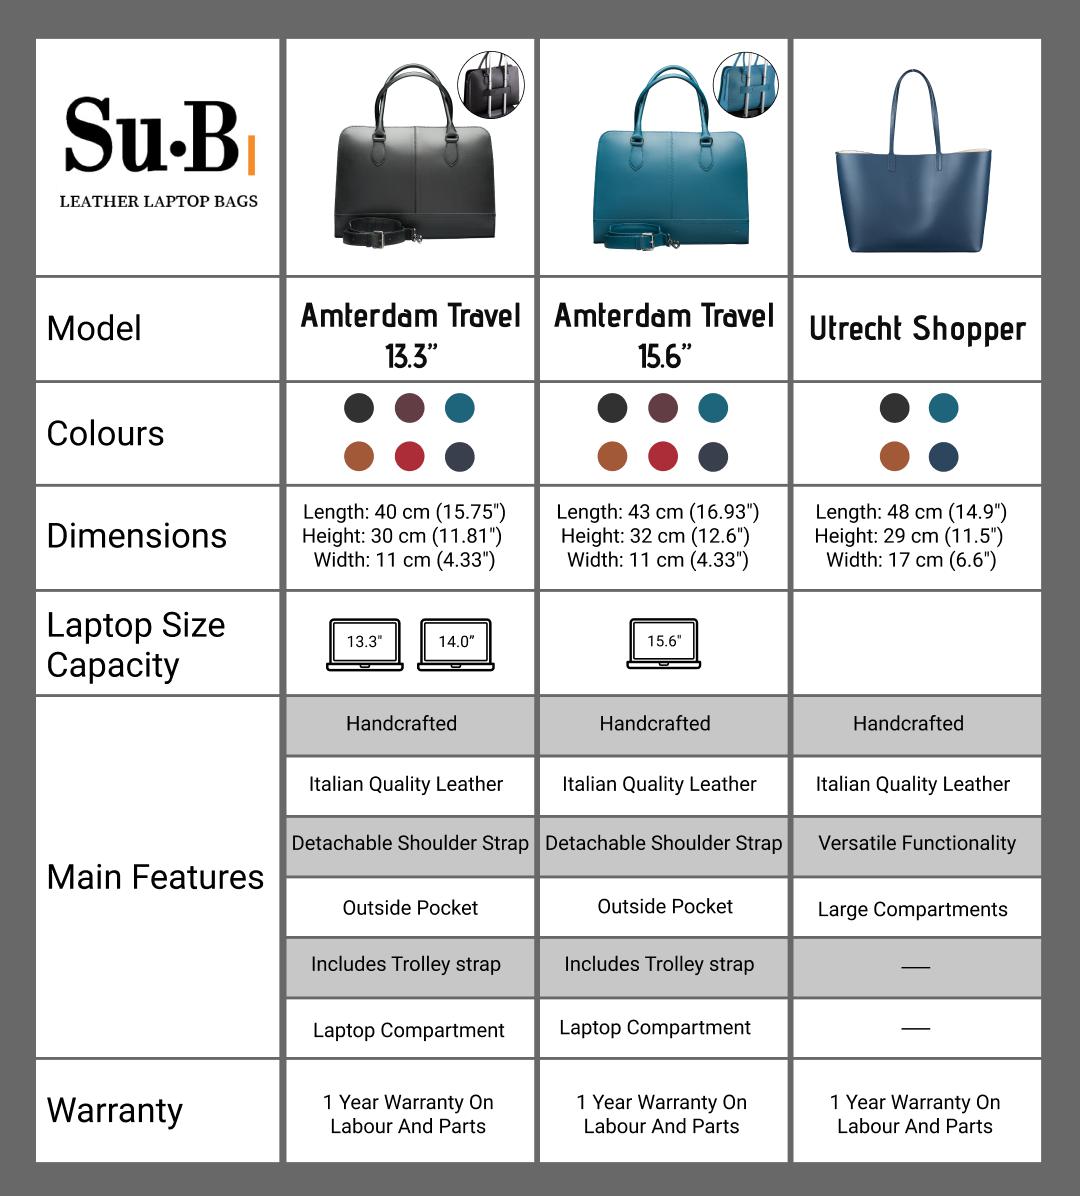 Welche Tasche passt am besten zu dir?